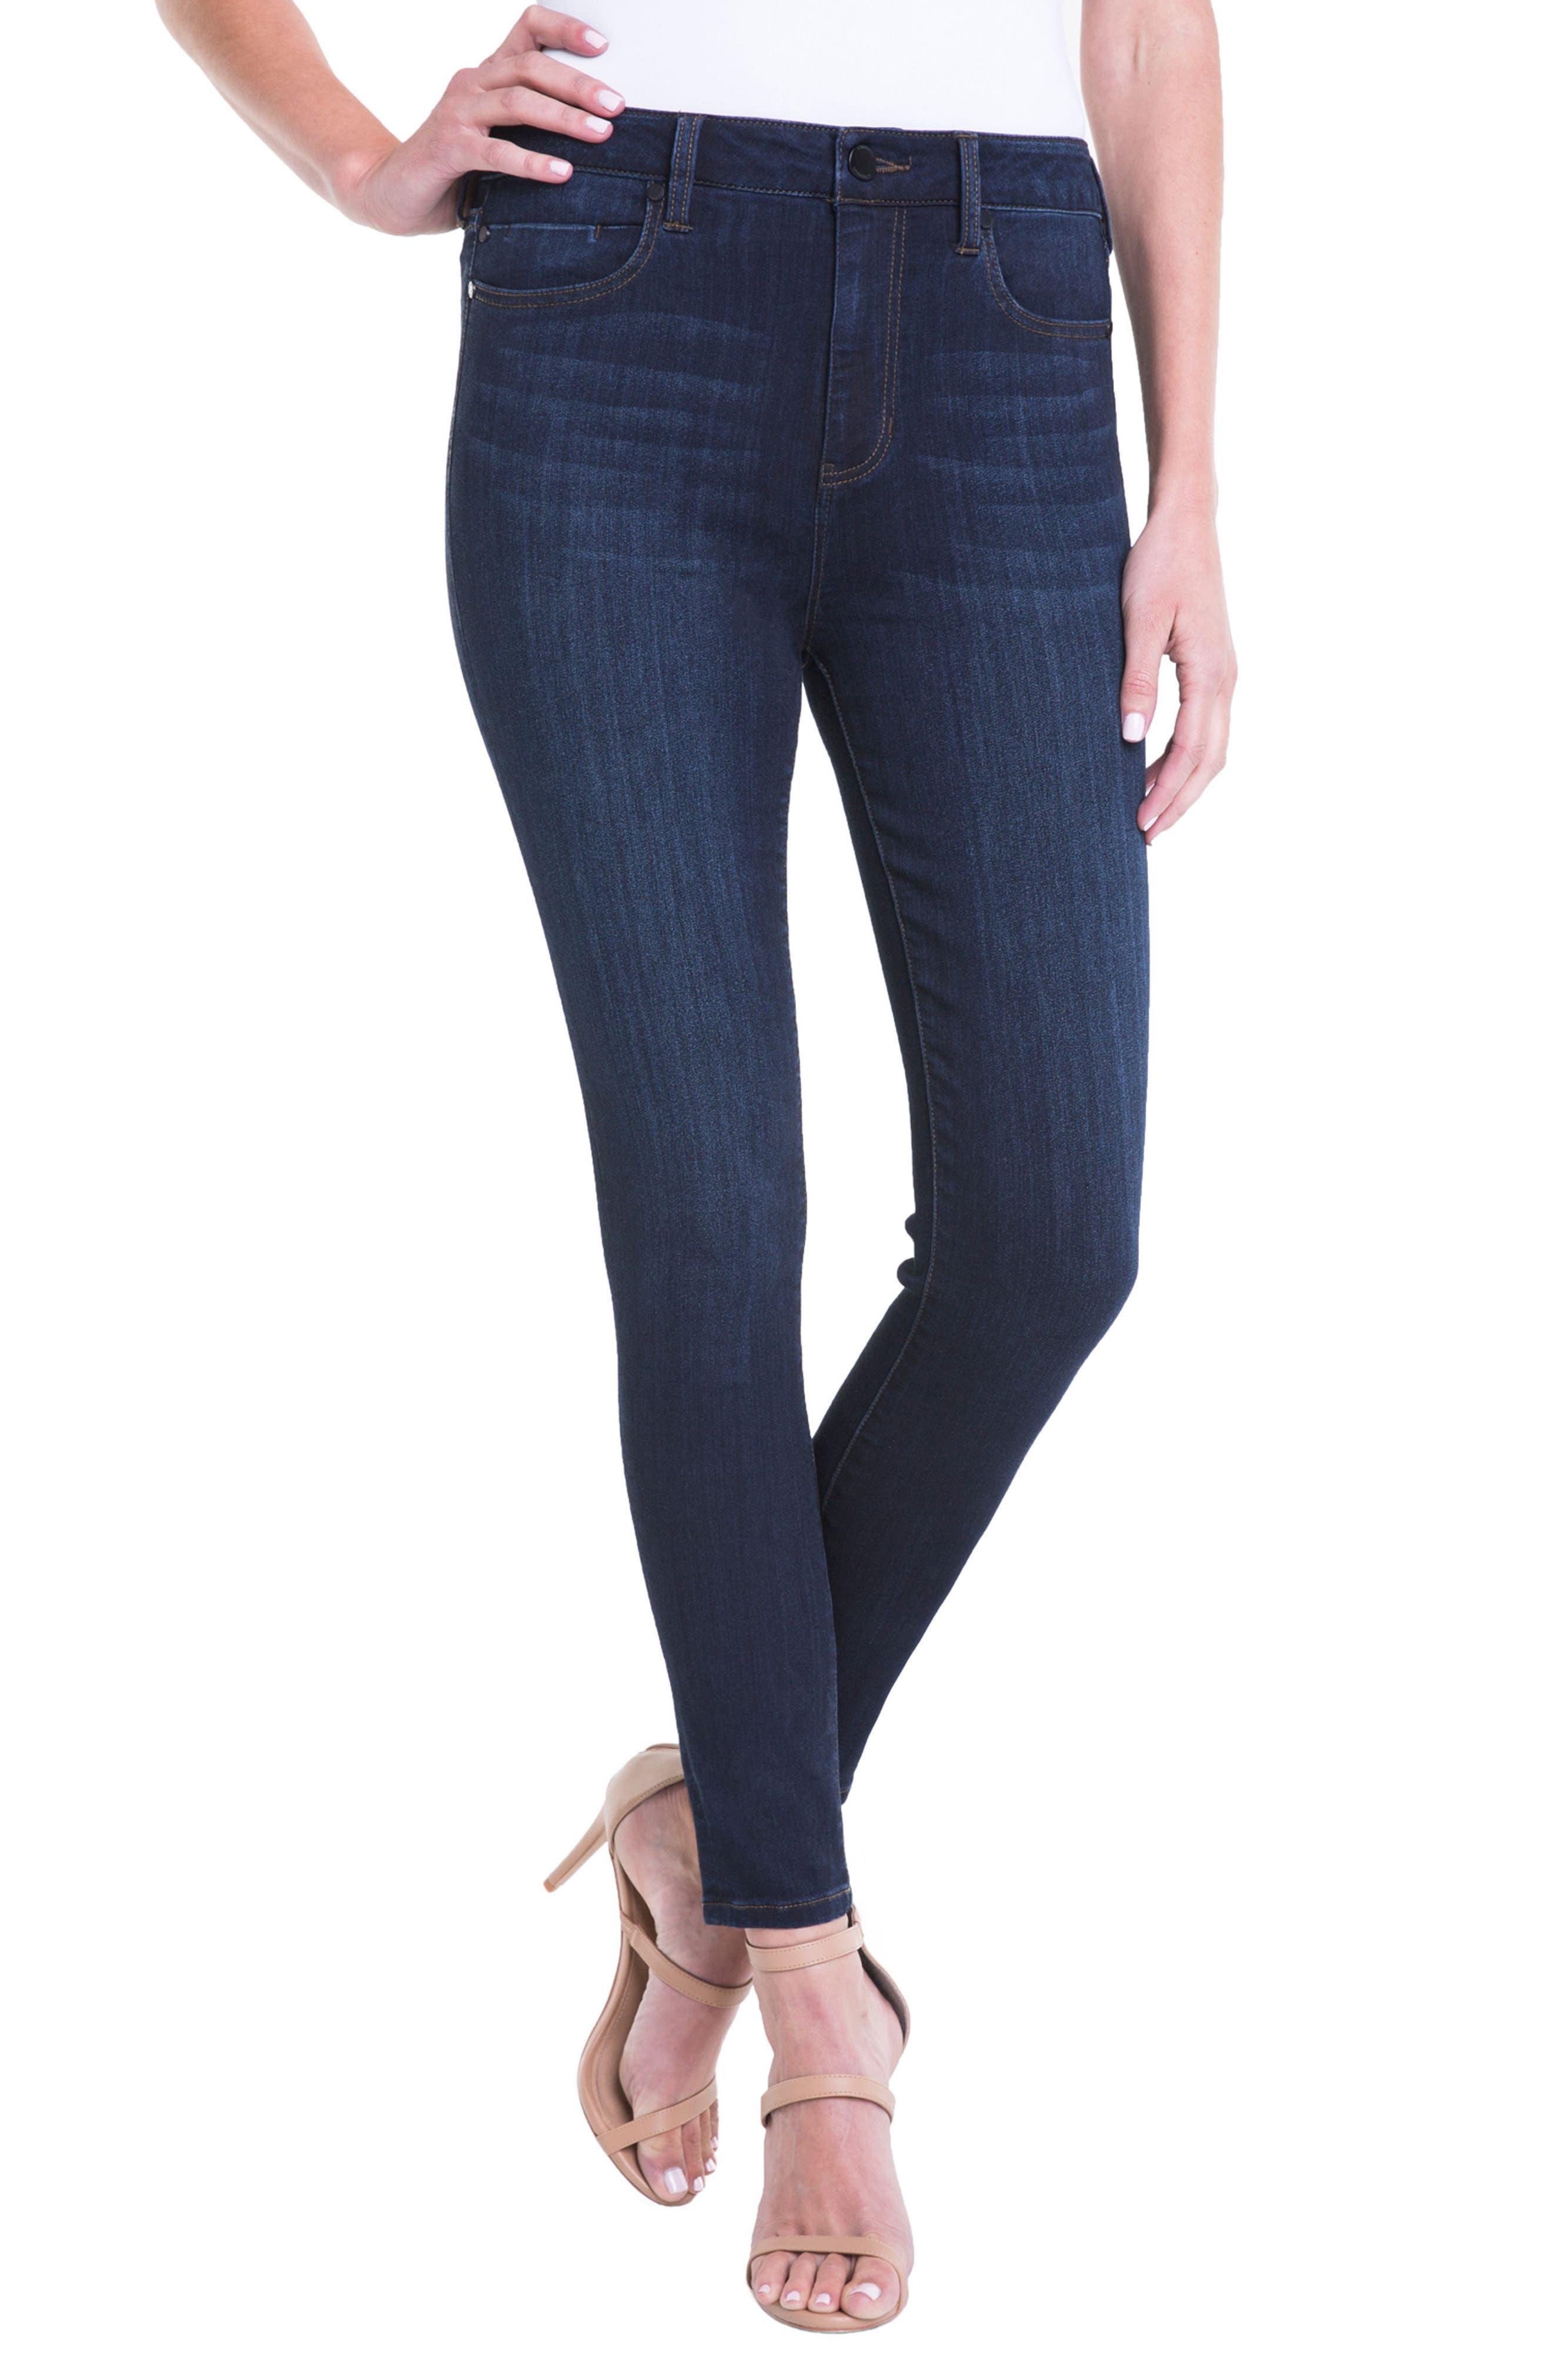 Alternate Image 1 Selected - Liverpool Jeans Company Bridget High Waist Skinny Jeans